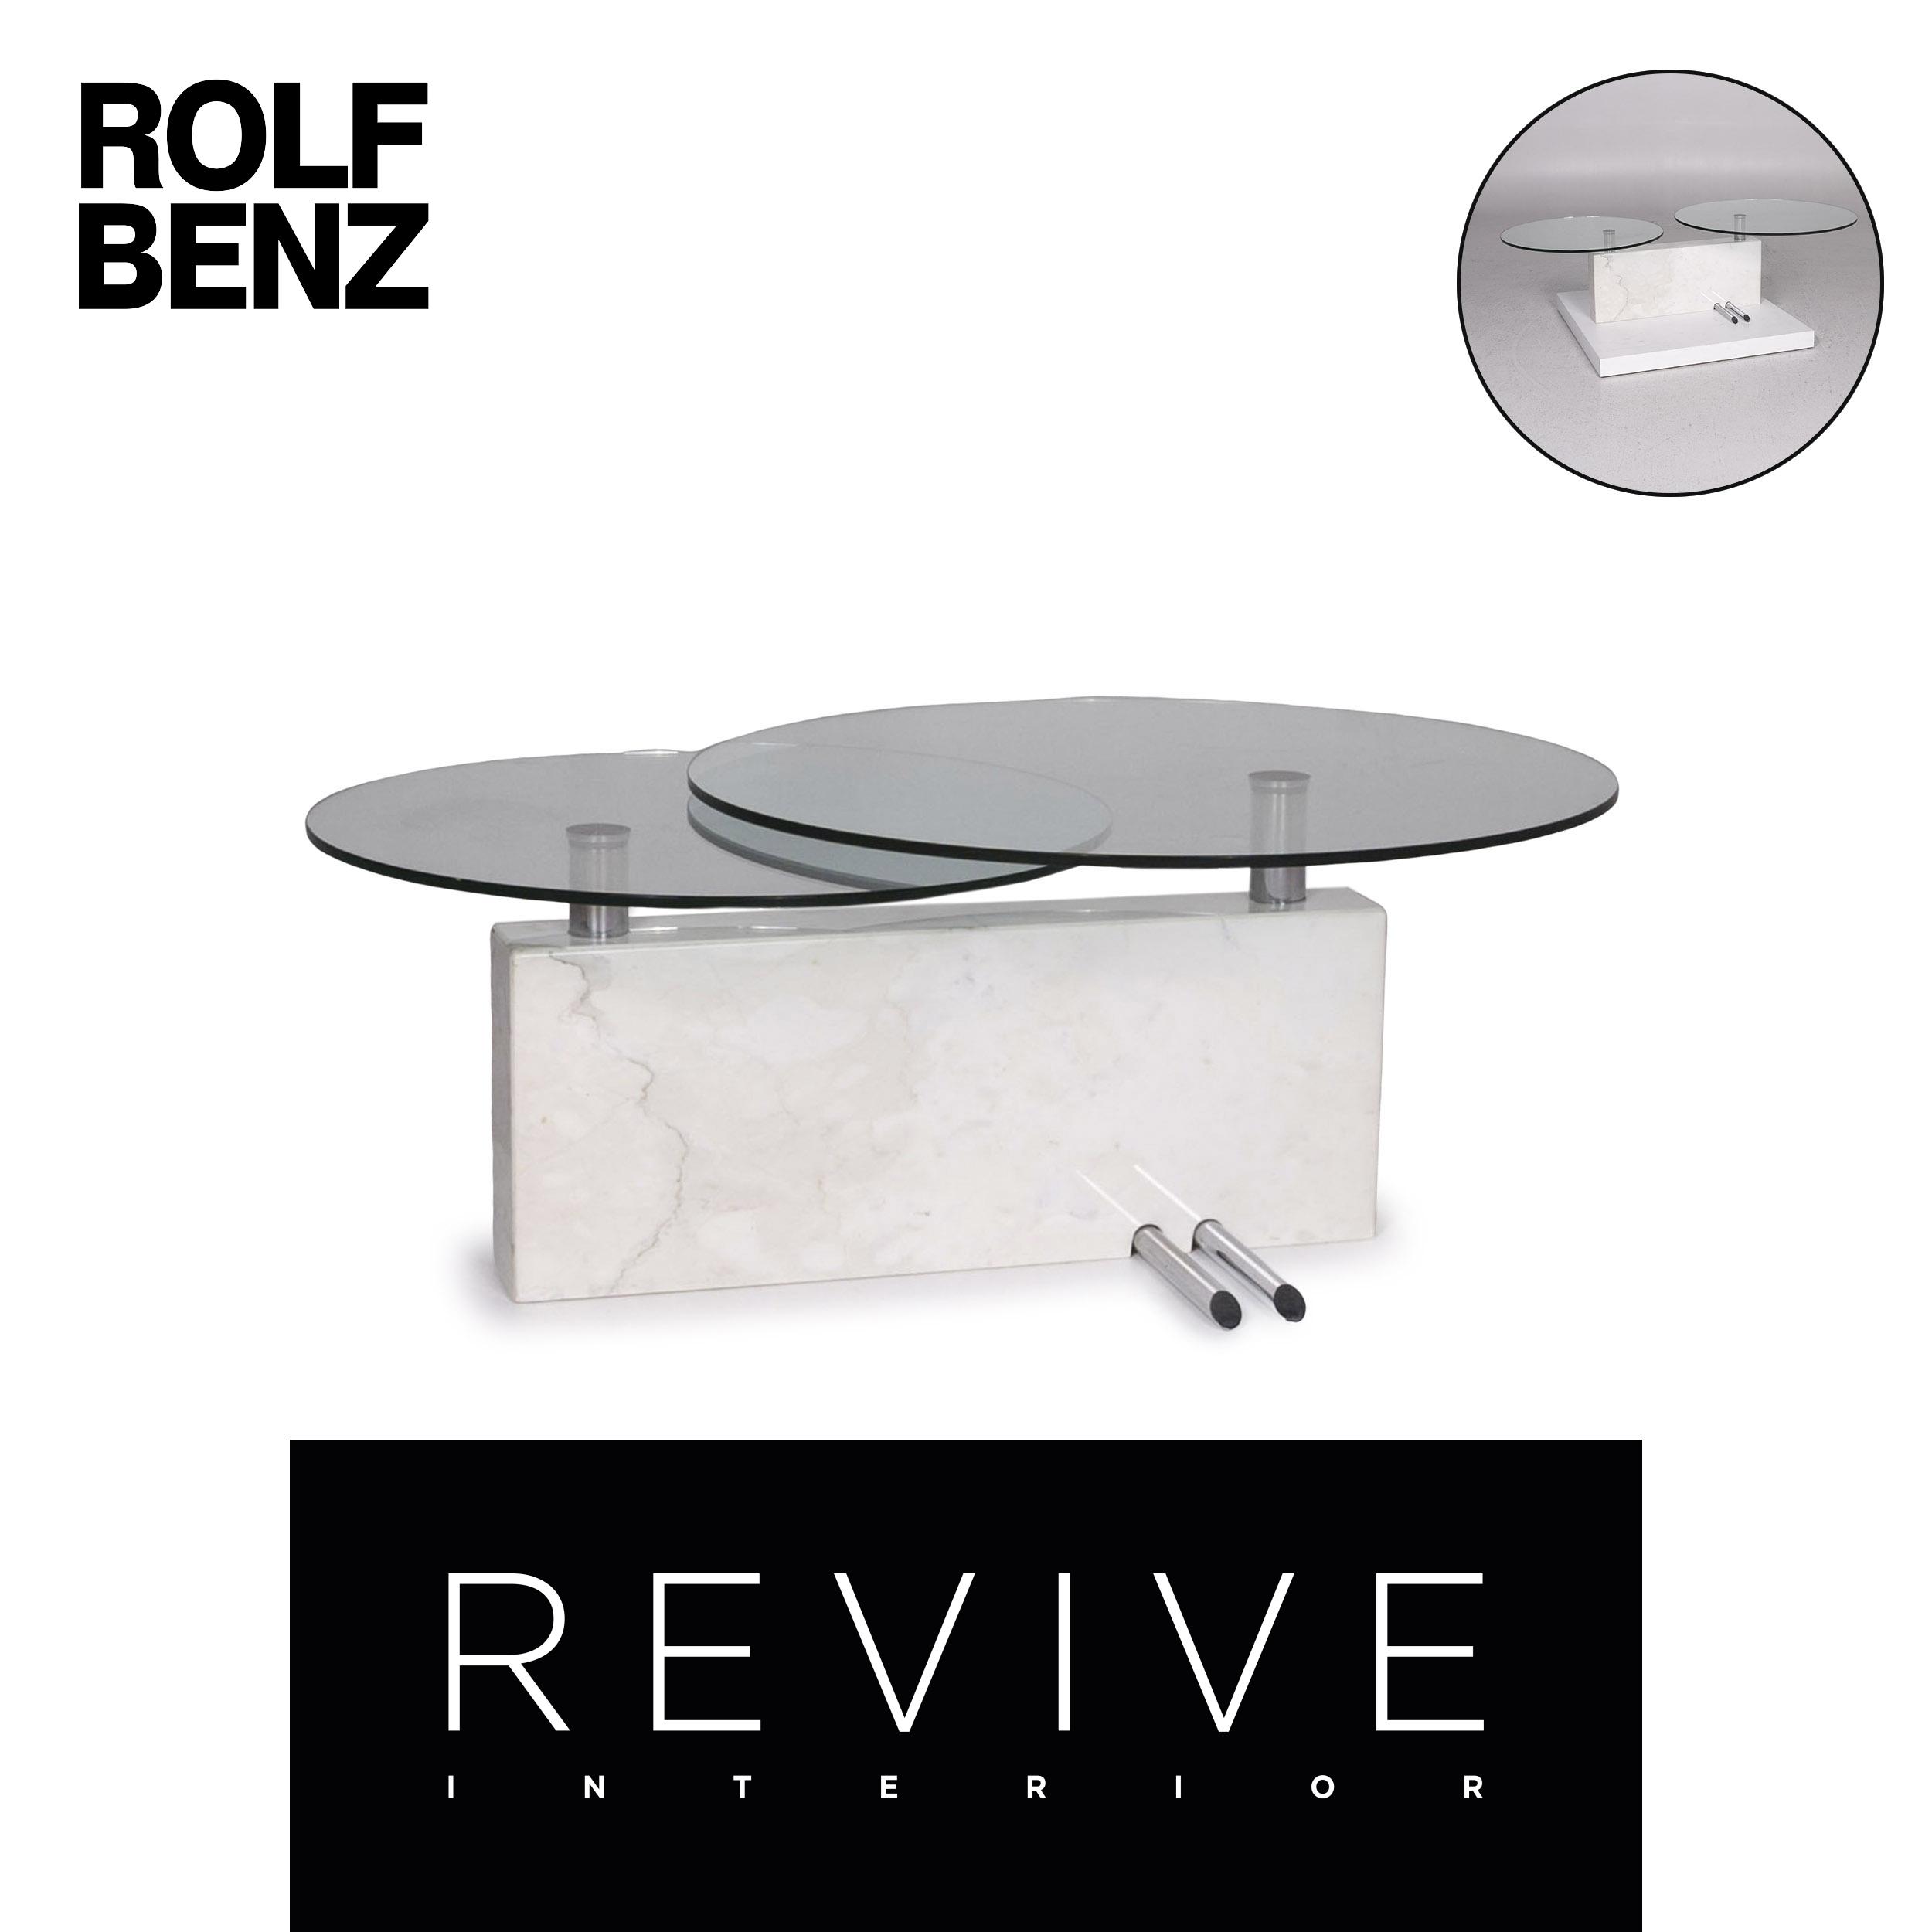 Rolf Benz Vidrio Marmol Sofa Mesa Mesa De Funcion 12191 Ebay